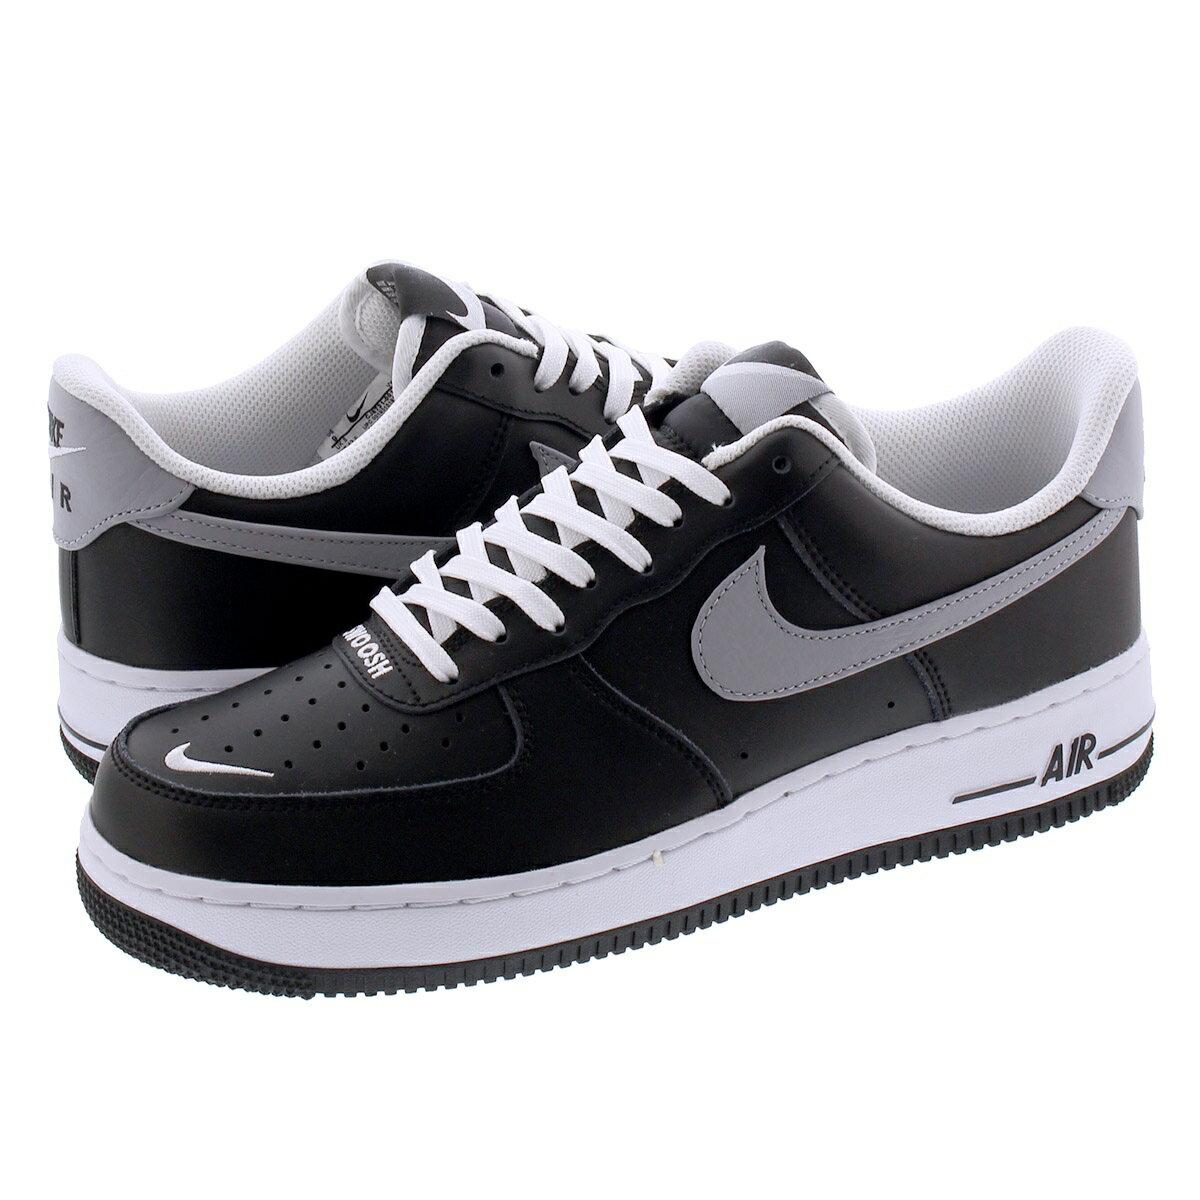 NIKE AIR FORCE 1 '07 LV8 4 Nike air force 1 07 LV8 4 BLACKWOLF GREYWHITE cj8731 001